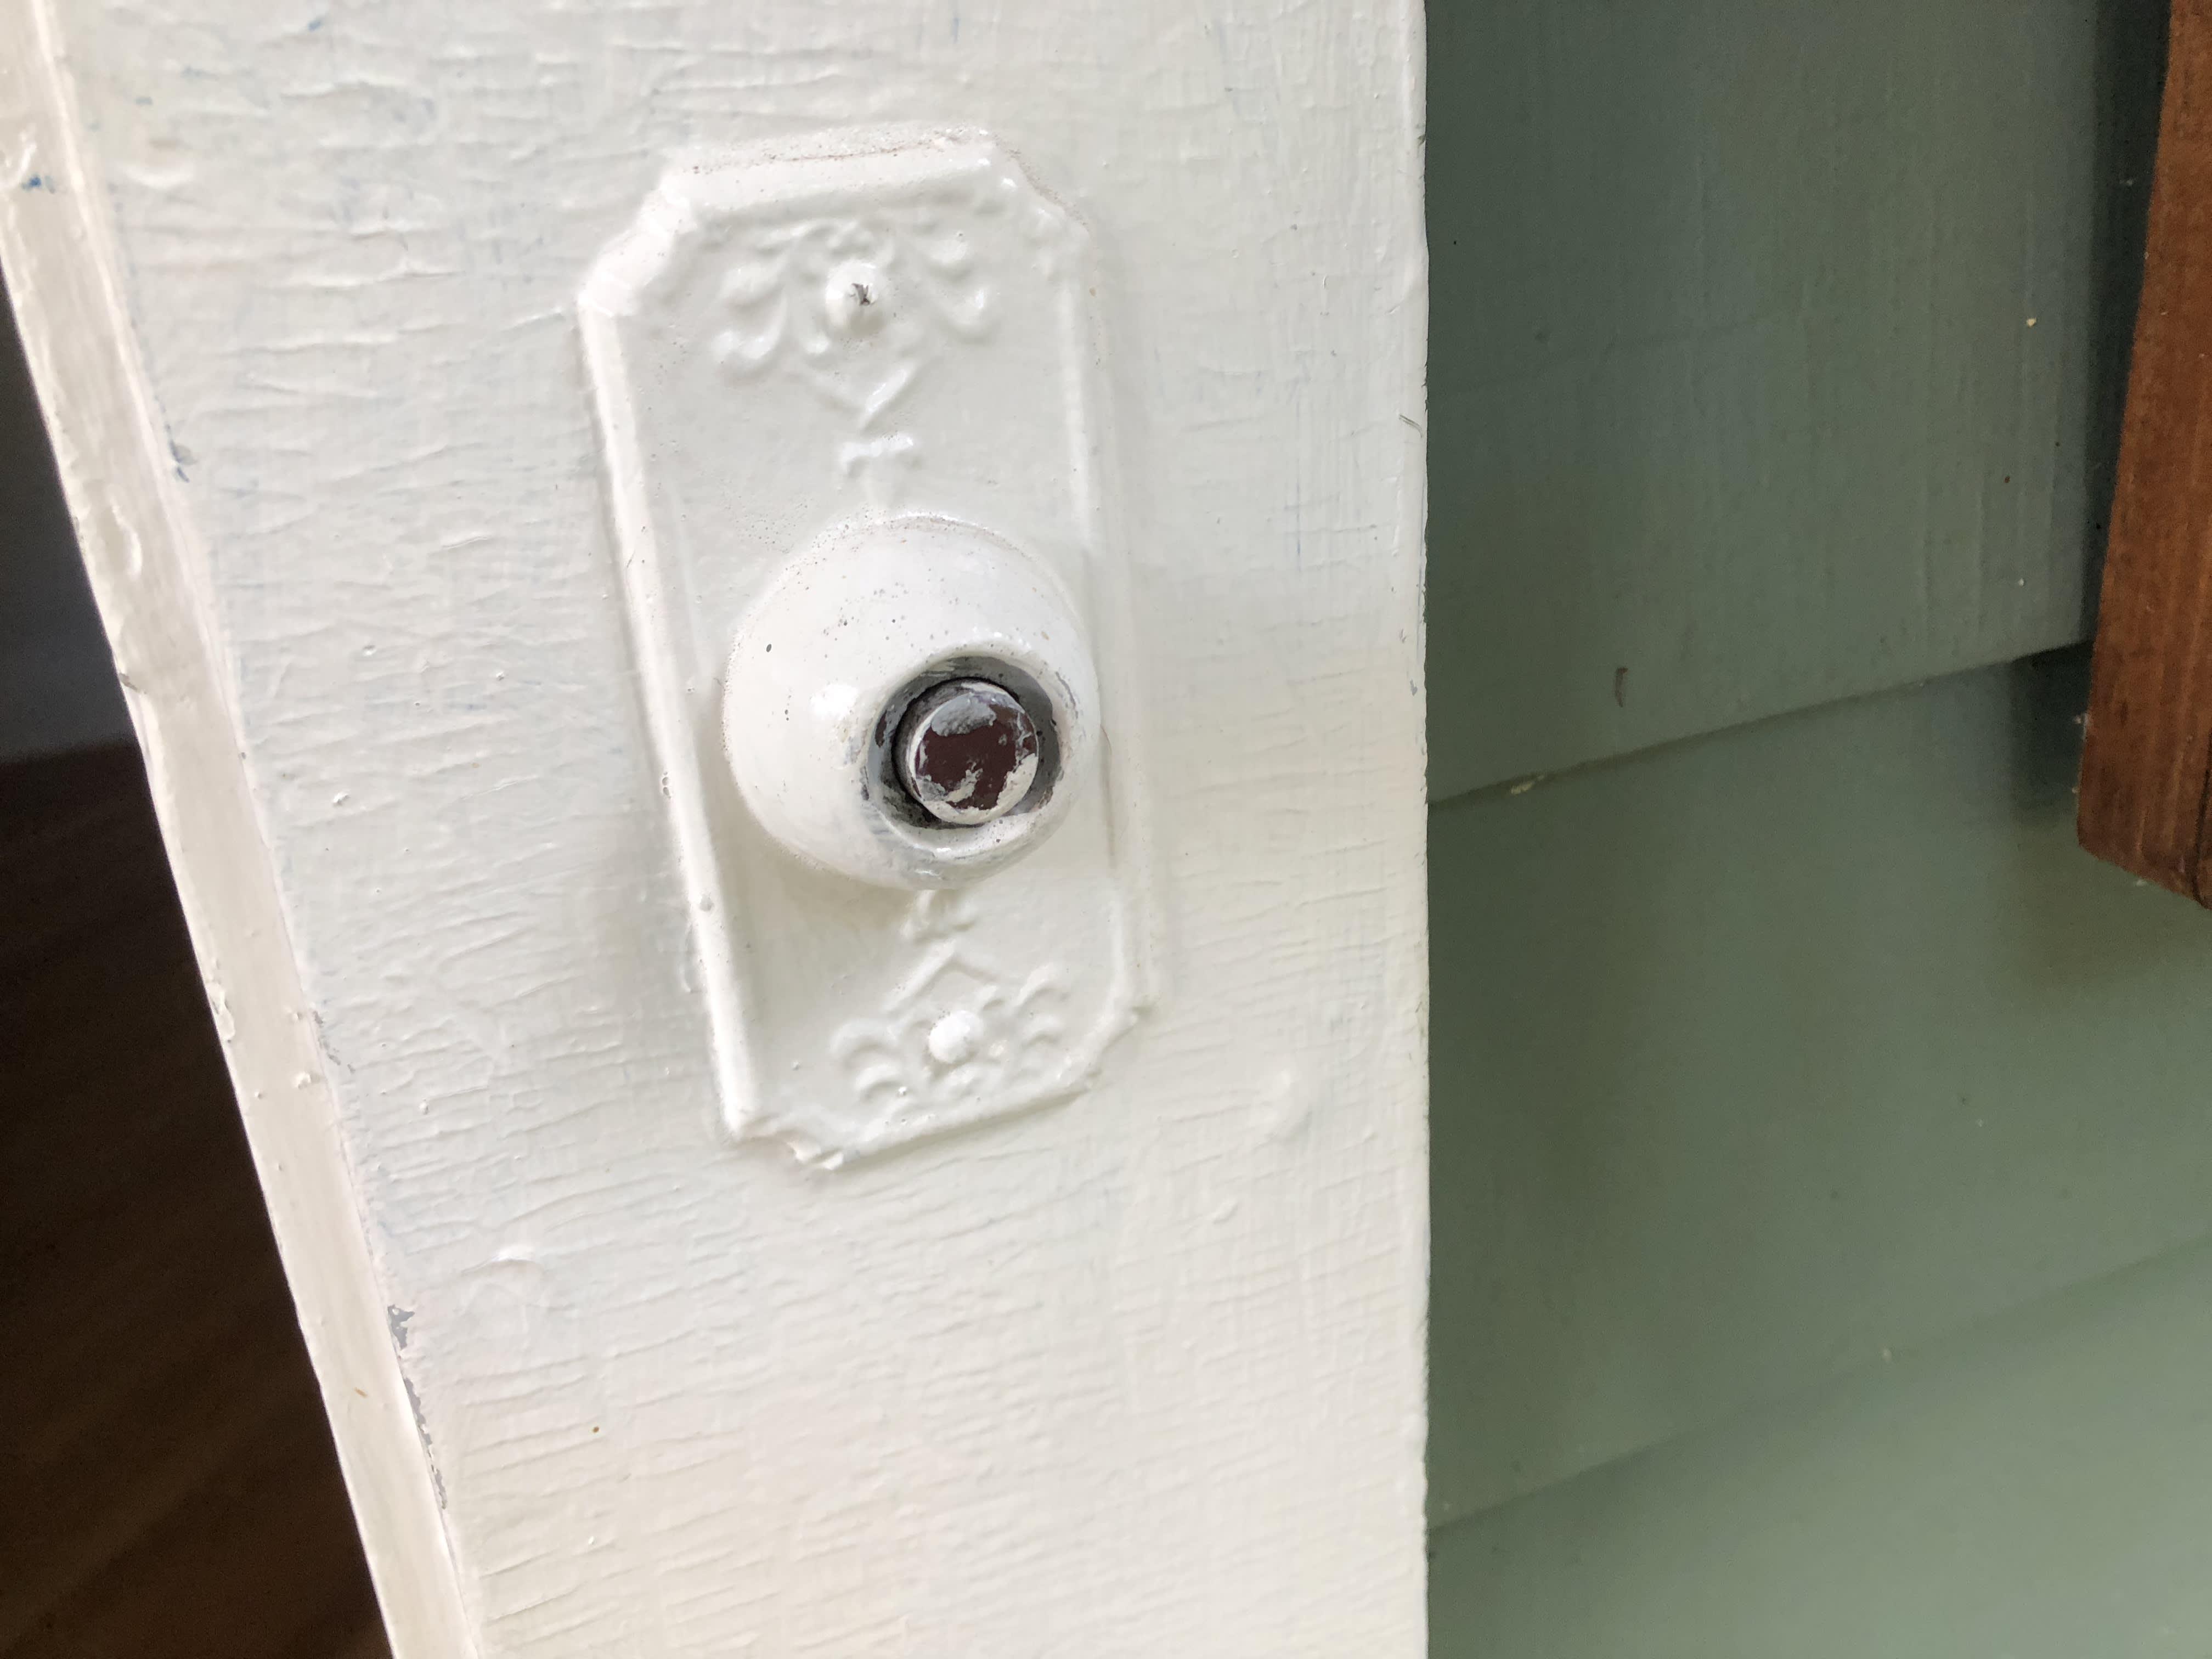 August Doorbell Cam Pro Review Rewiring Old